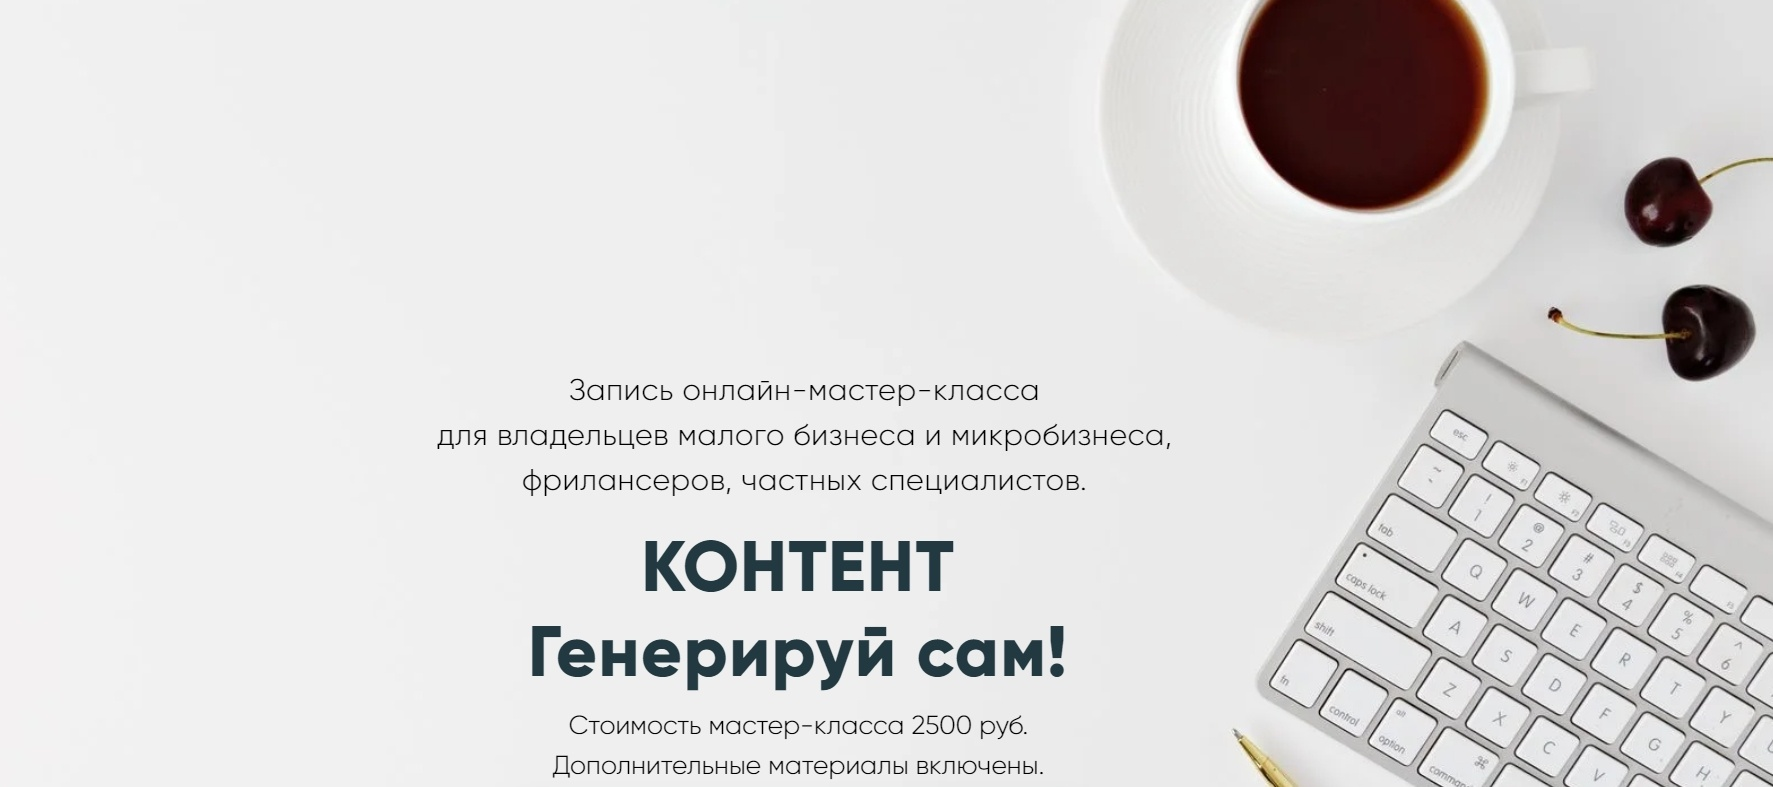 kontent-banner-azconsult-ru